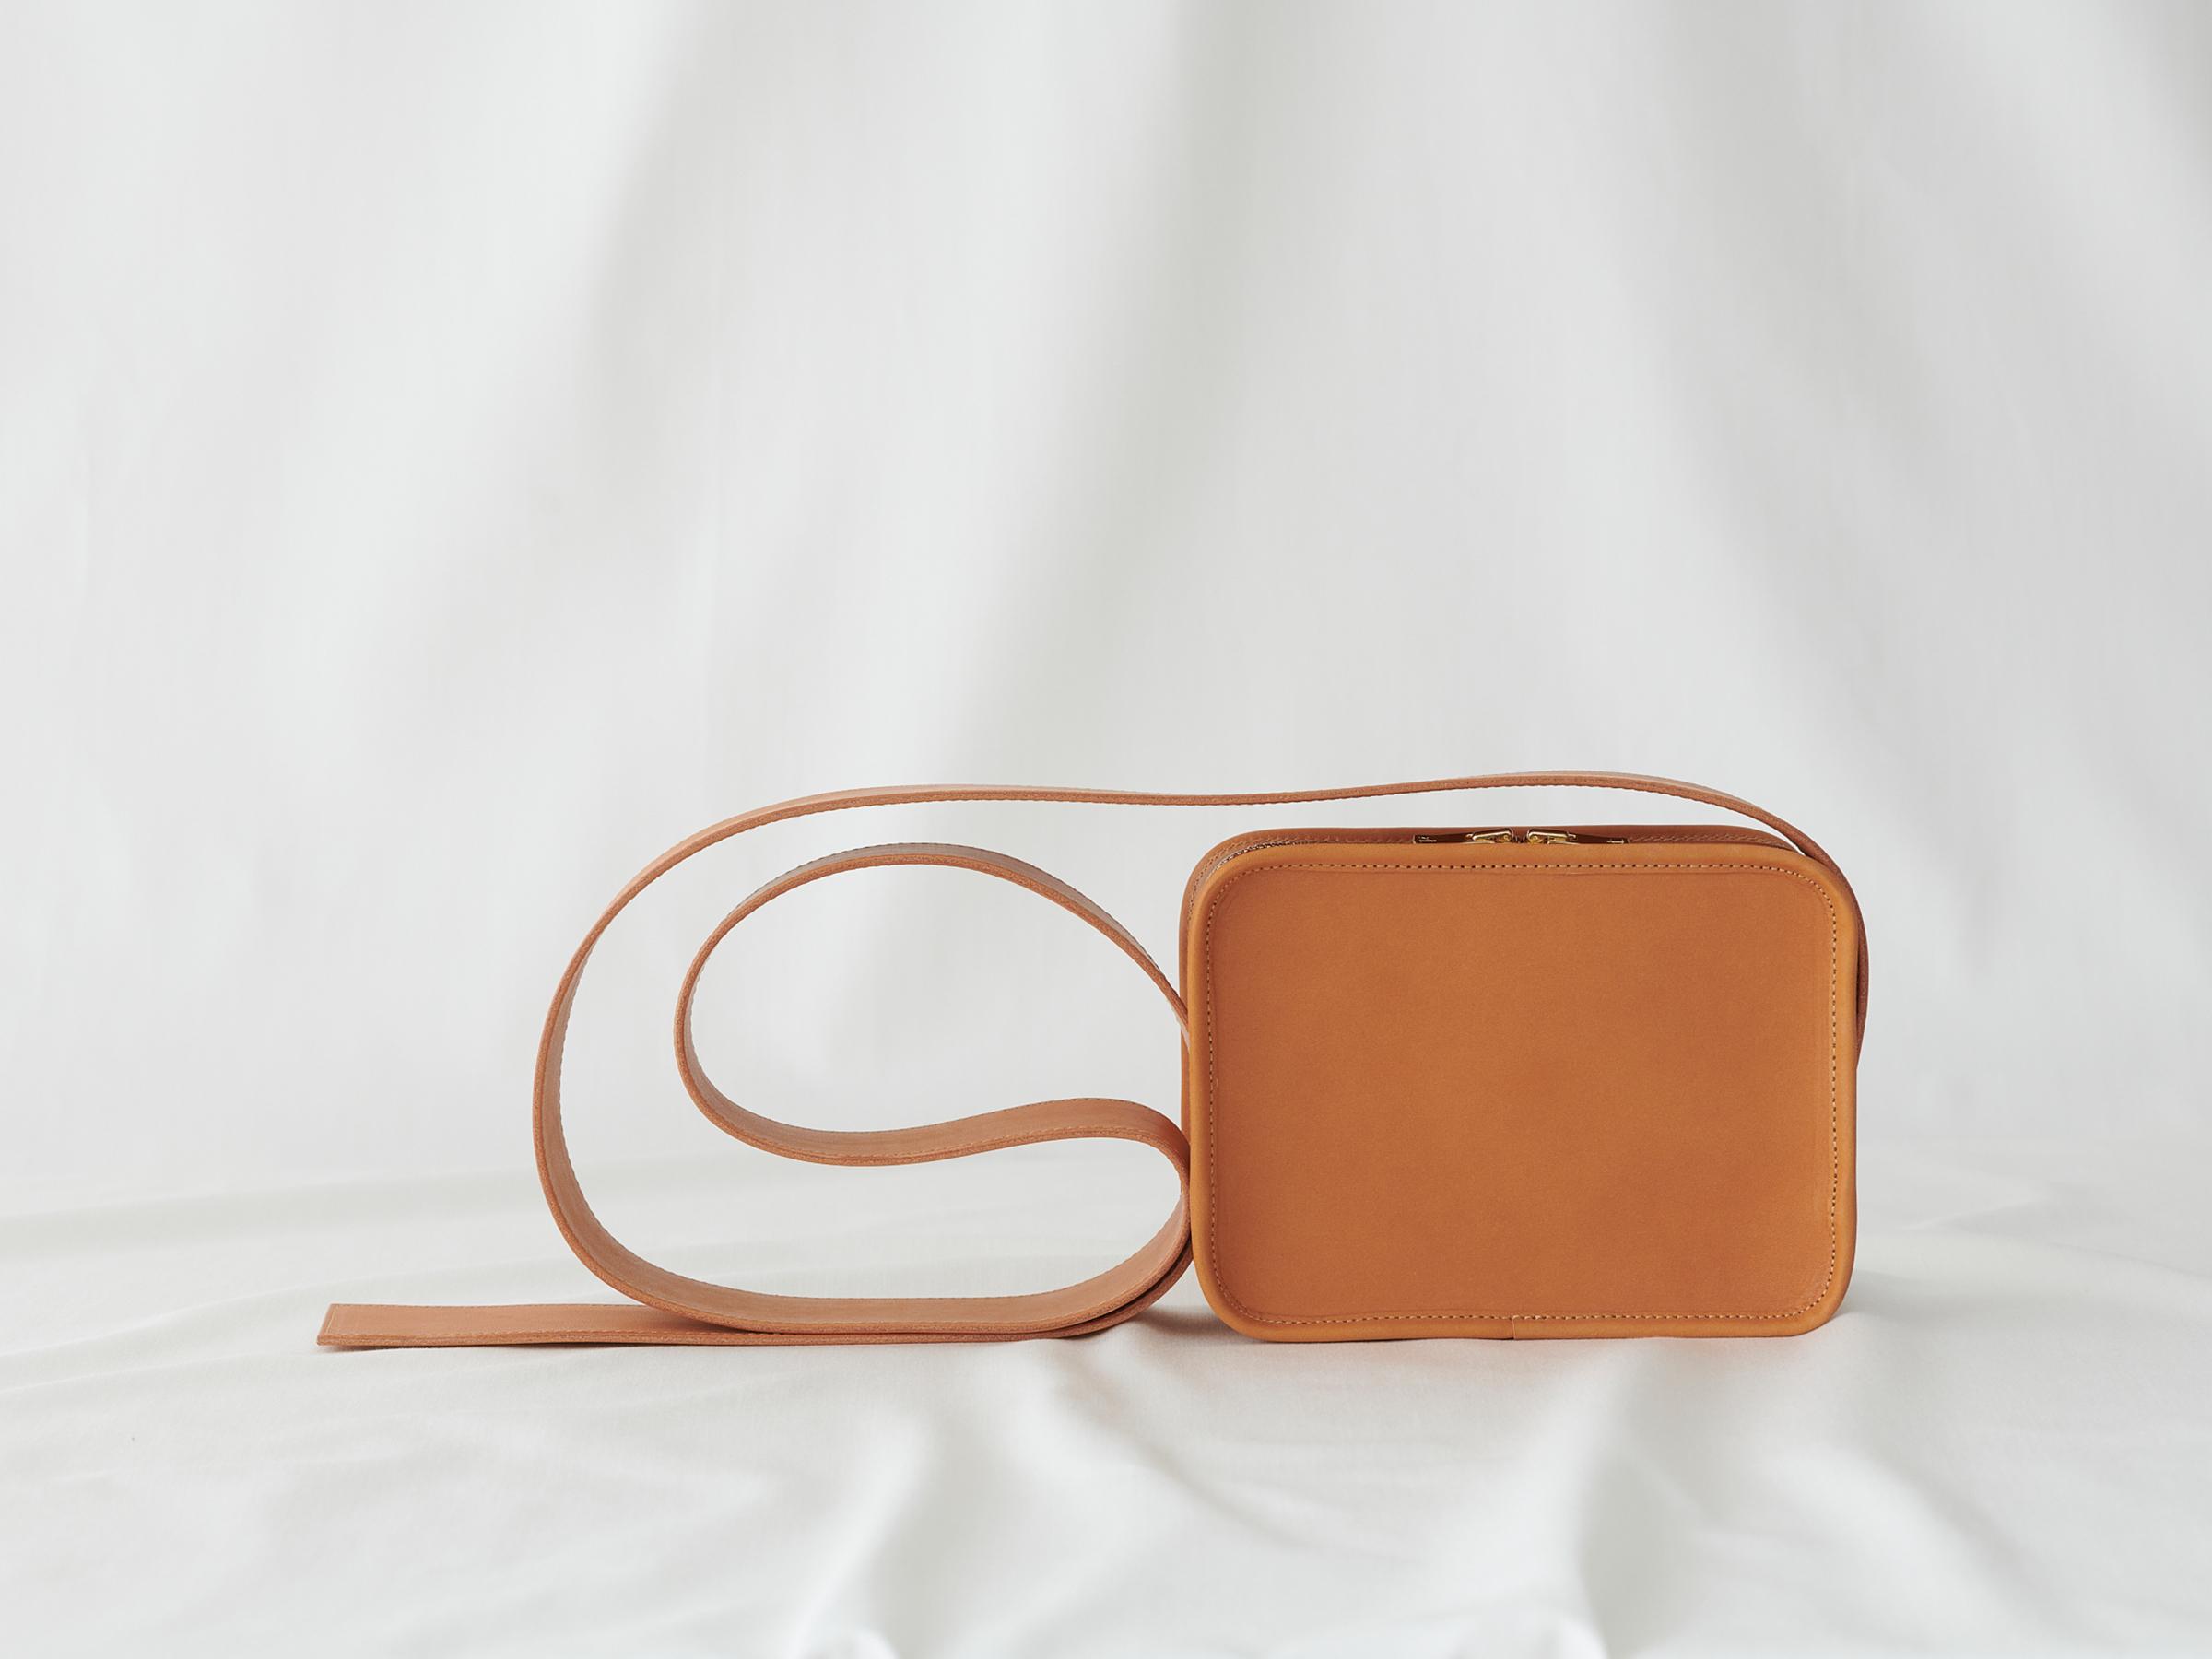 【LIMITED】Leather Shoulder Mini Book Bag / CAMEL -EARTH LEATHER-